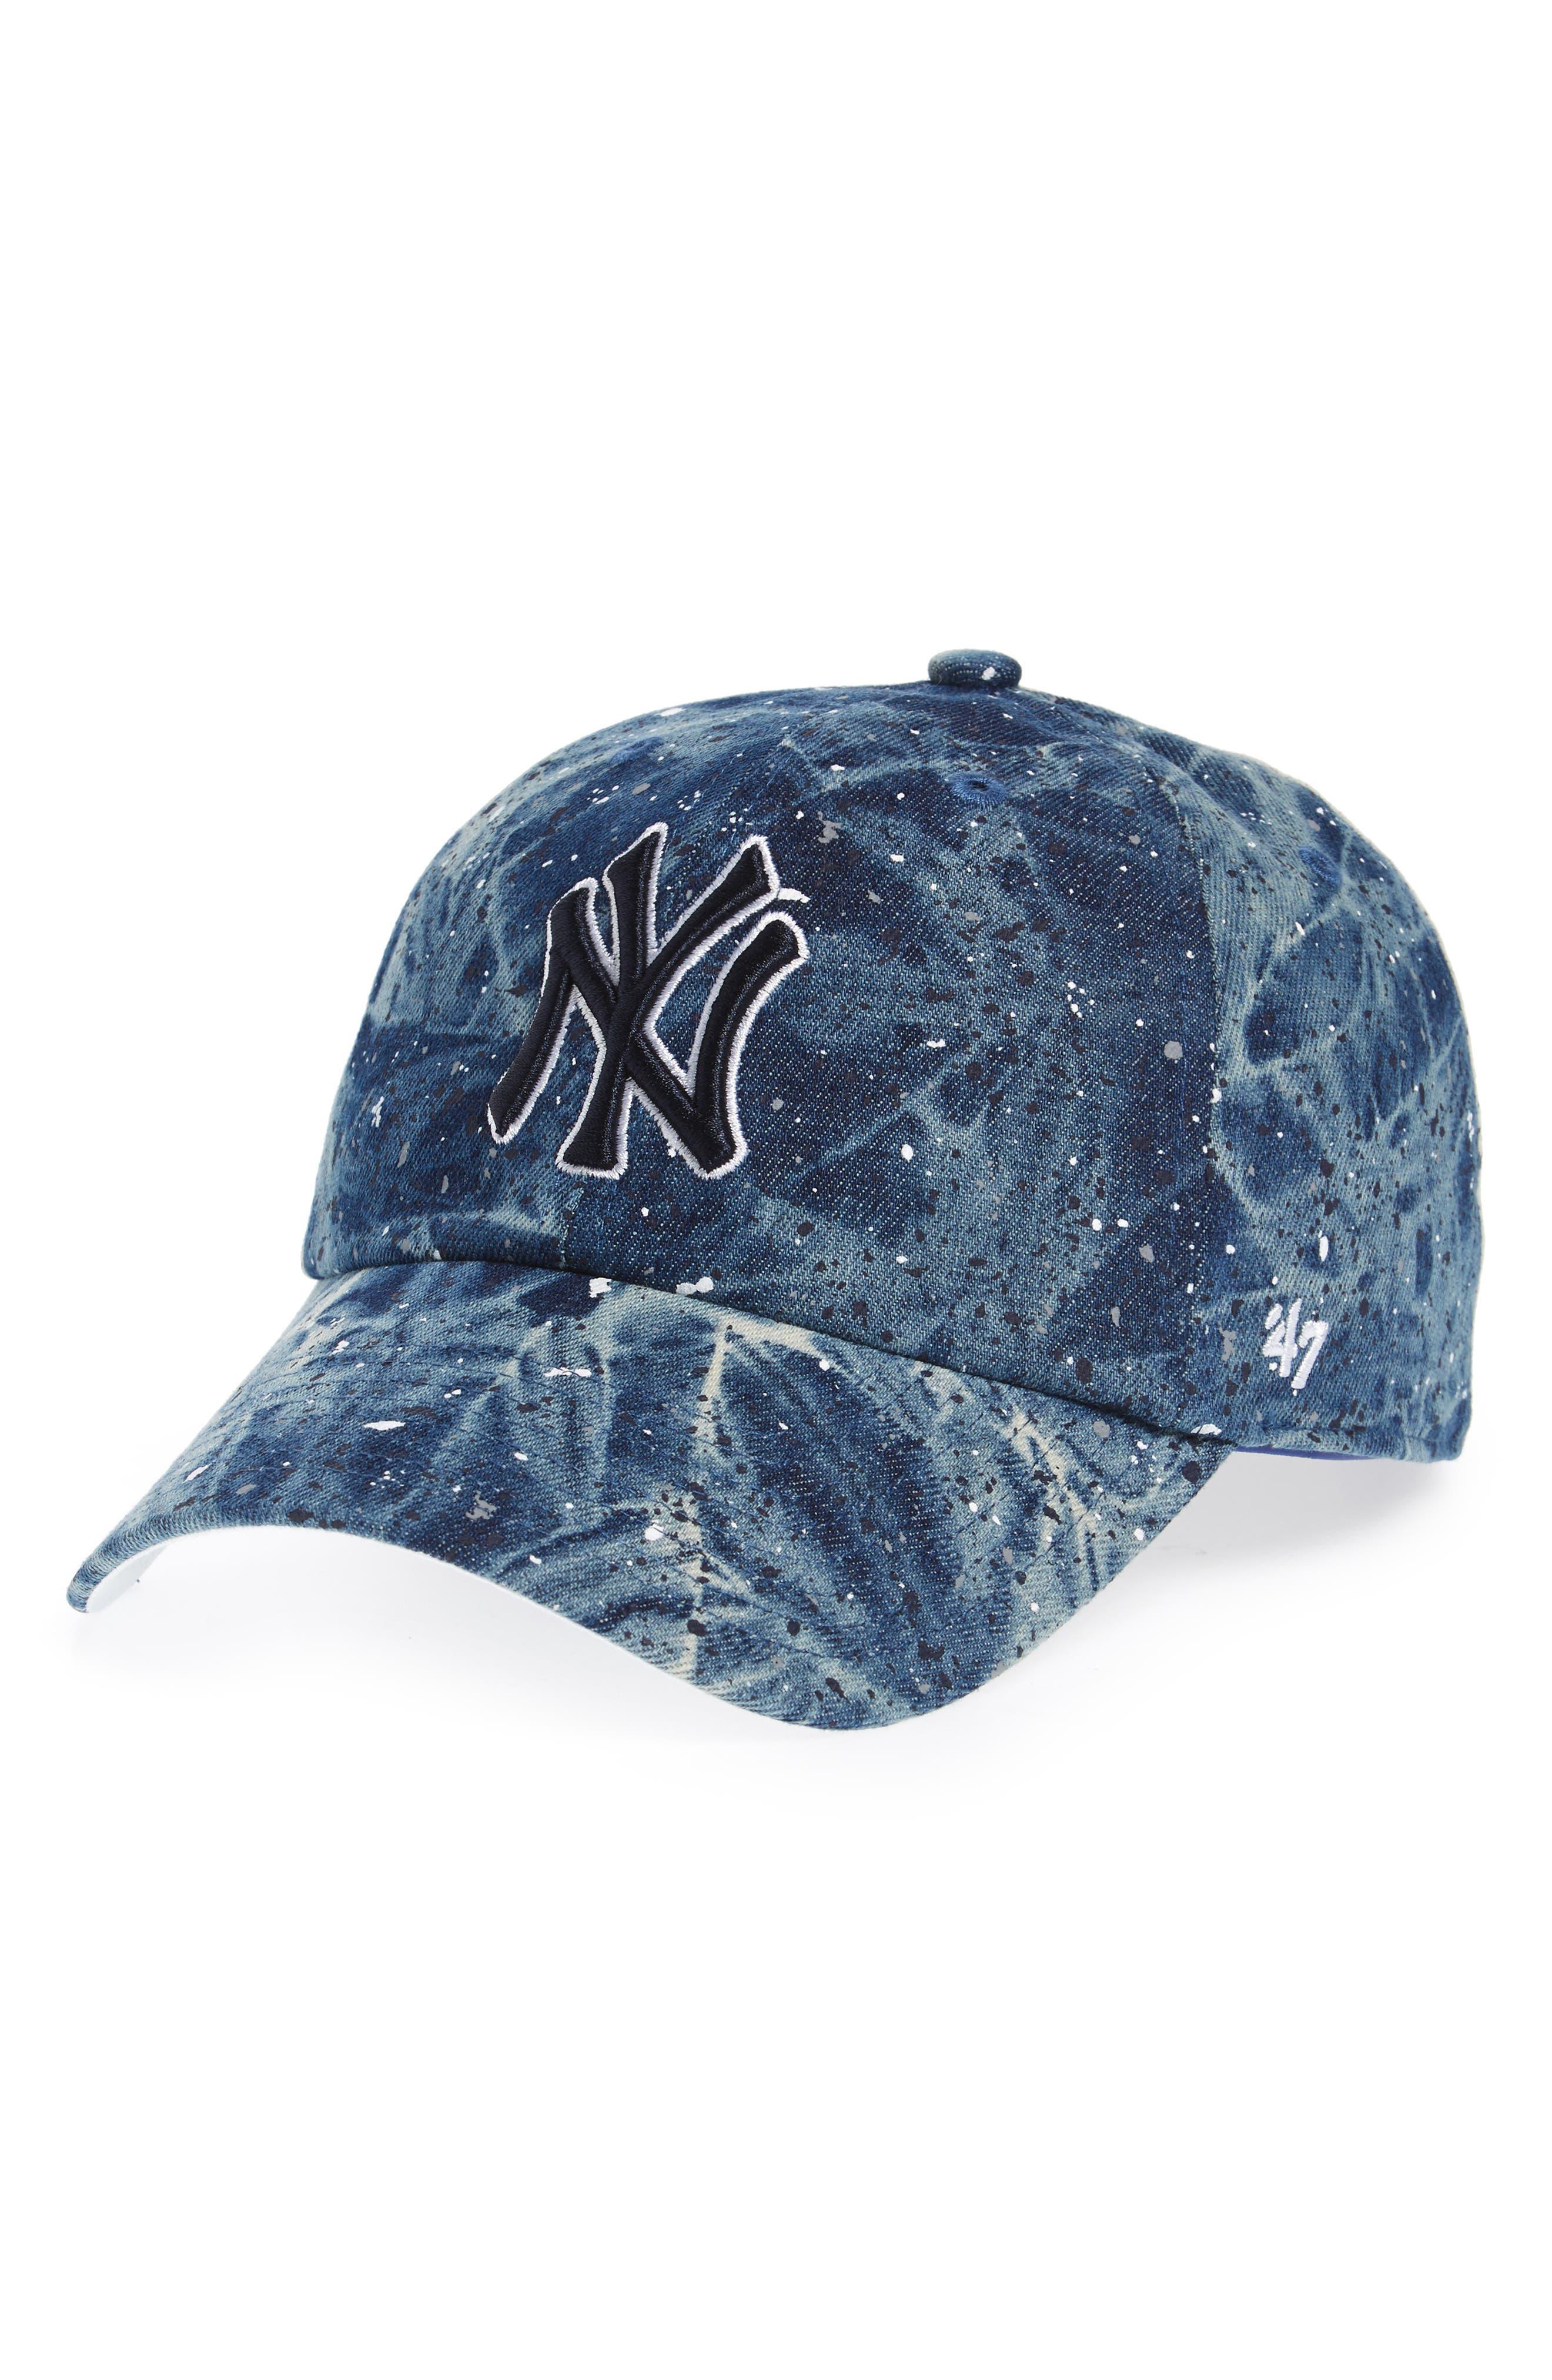 New York Yankees - Blue Splatter Baseball Cap,                         Main,                         color, Blue